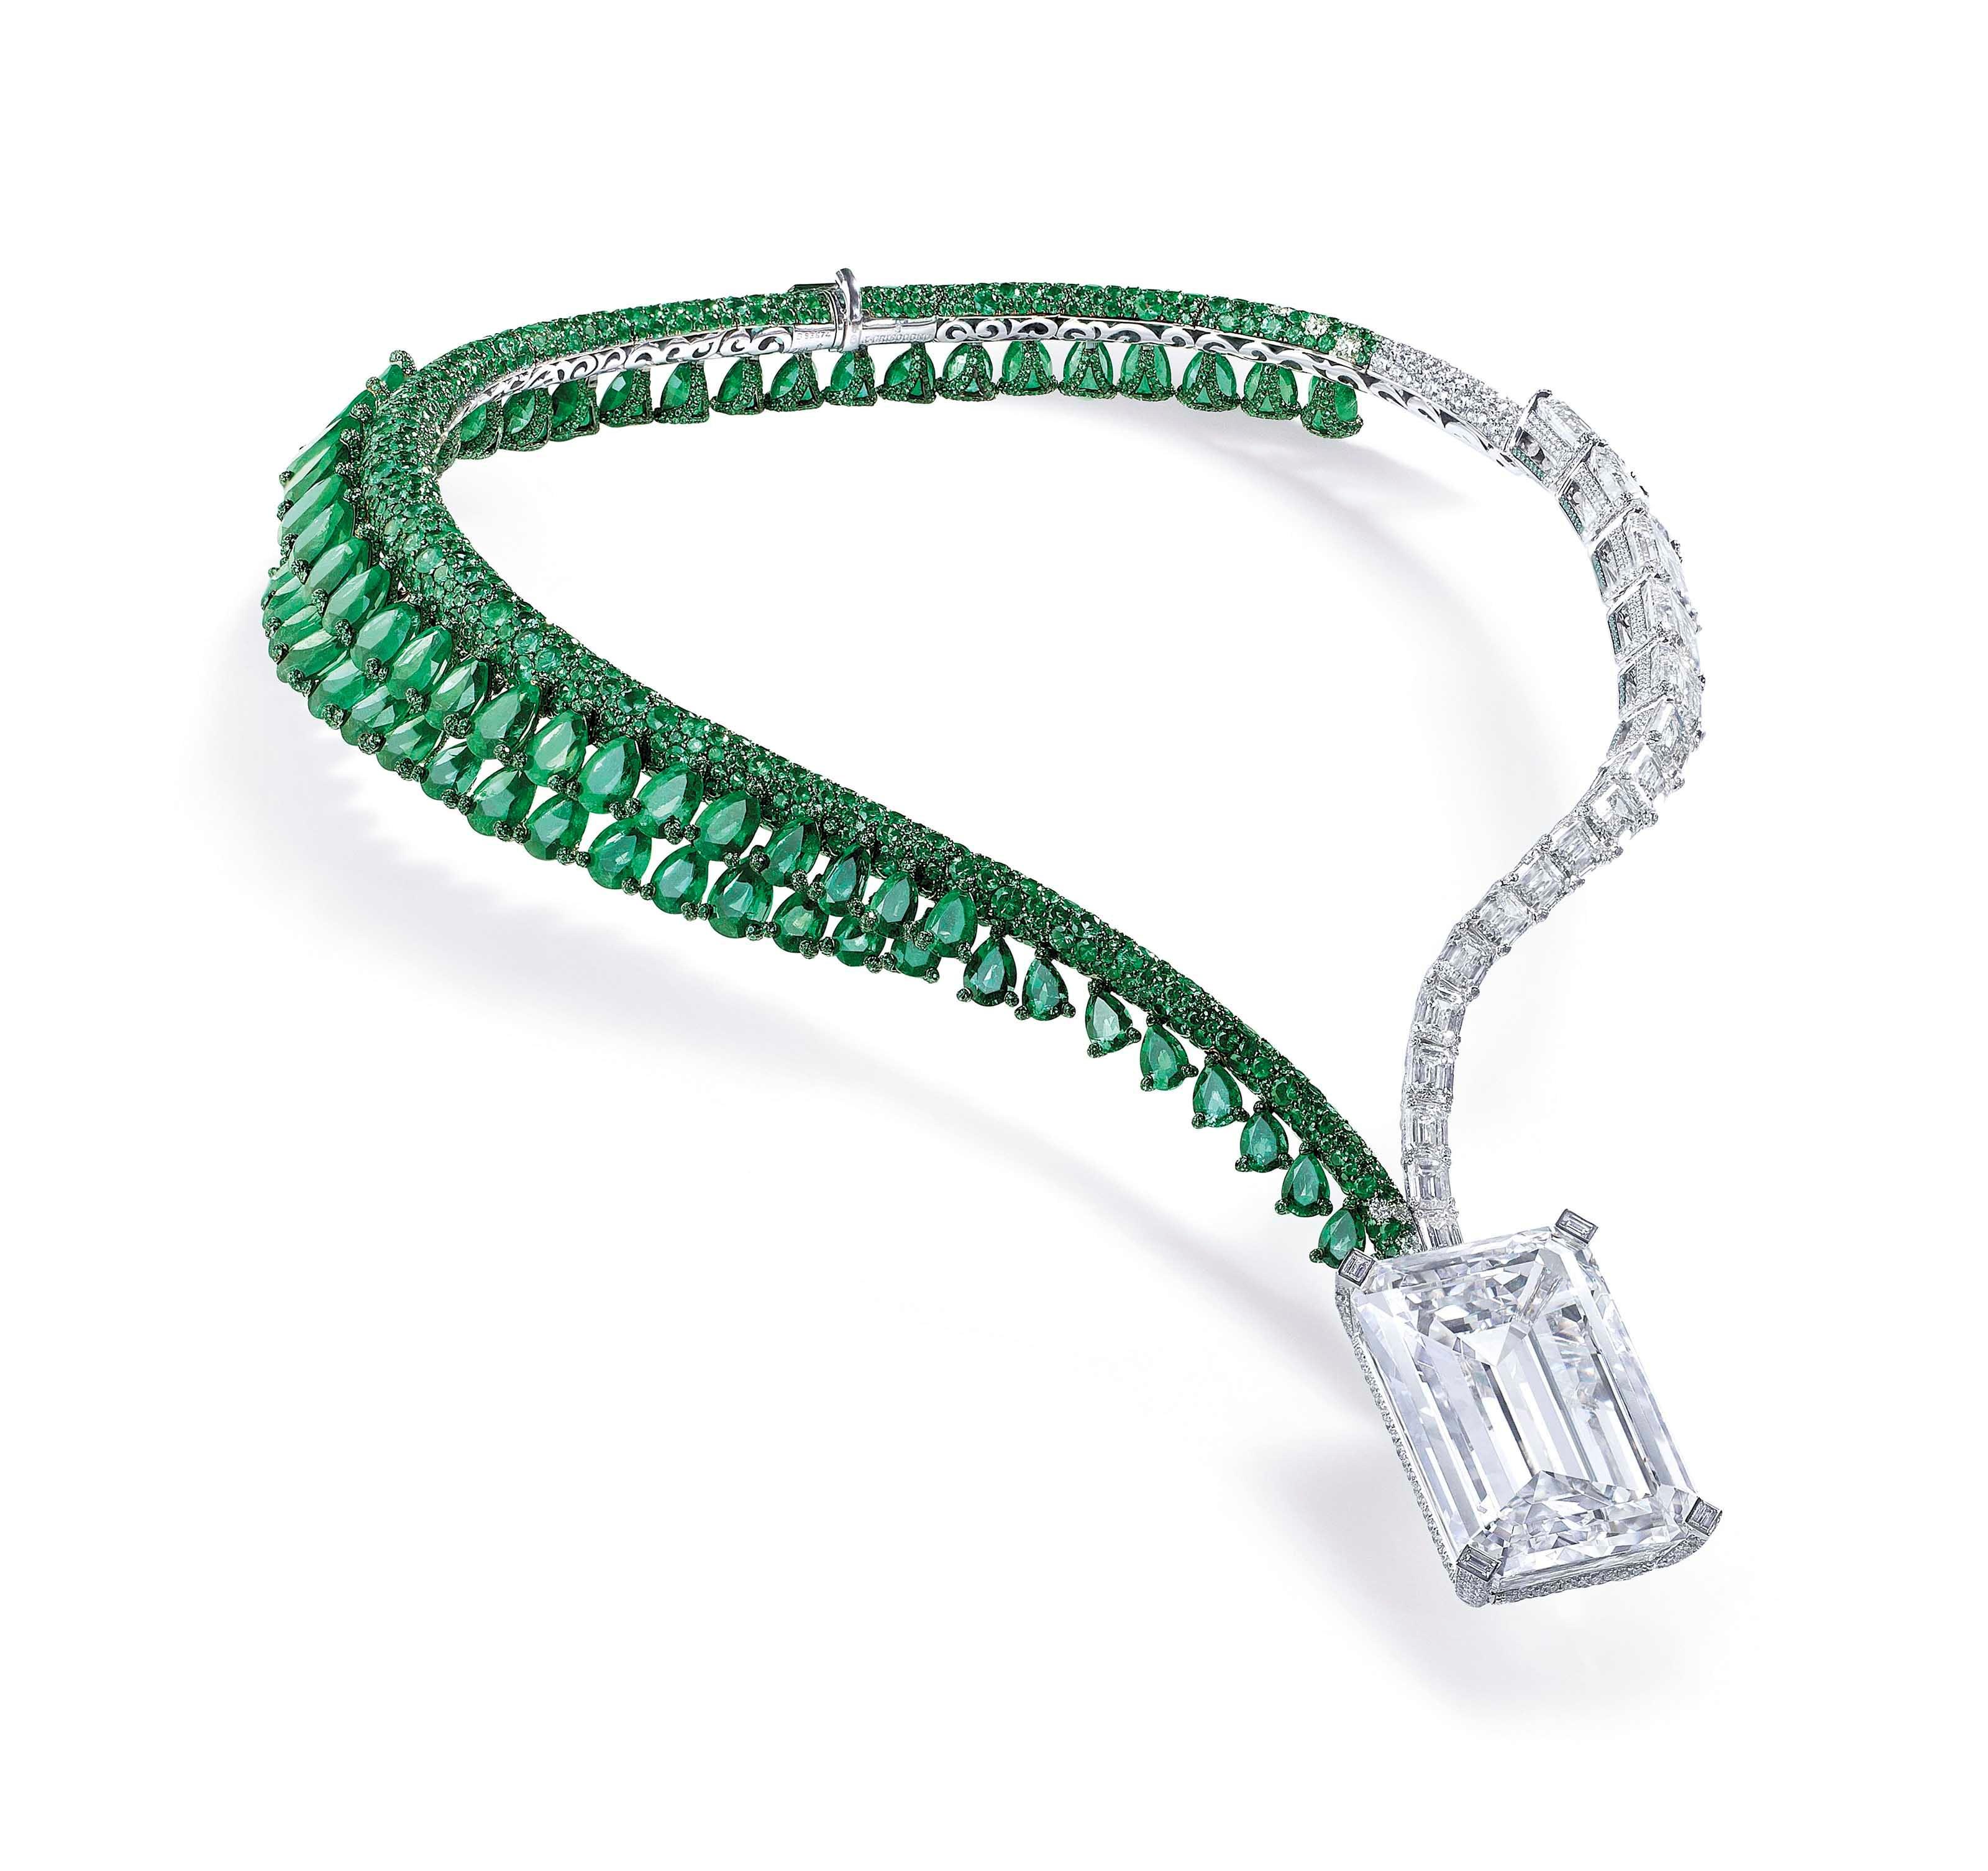 「The Art of De Grisogono — Creation I」钻石及祖母绿项链,镶嵌一颗163.41克拉无瑕美钻。2017年11月14日在佳士得日内瓦以33,500,000瑞郎成交。